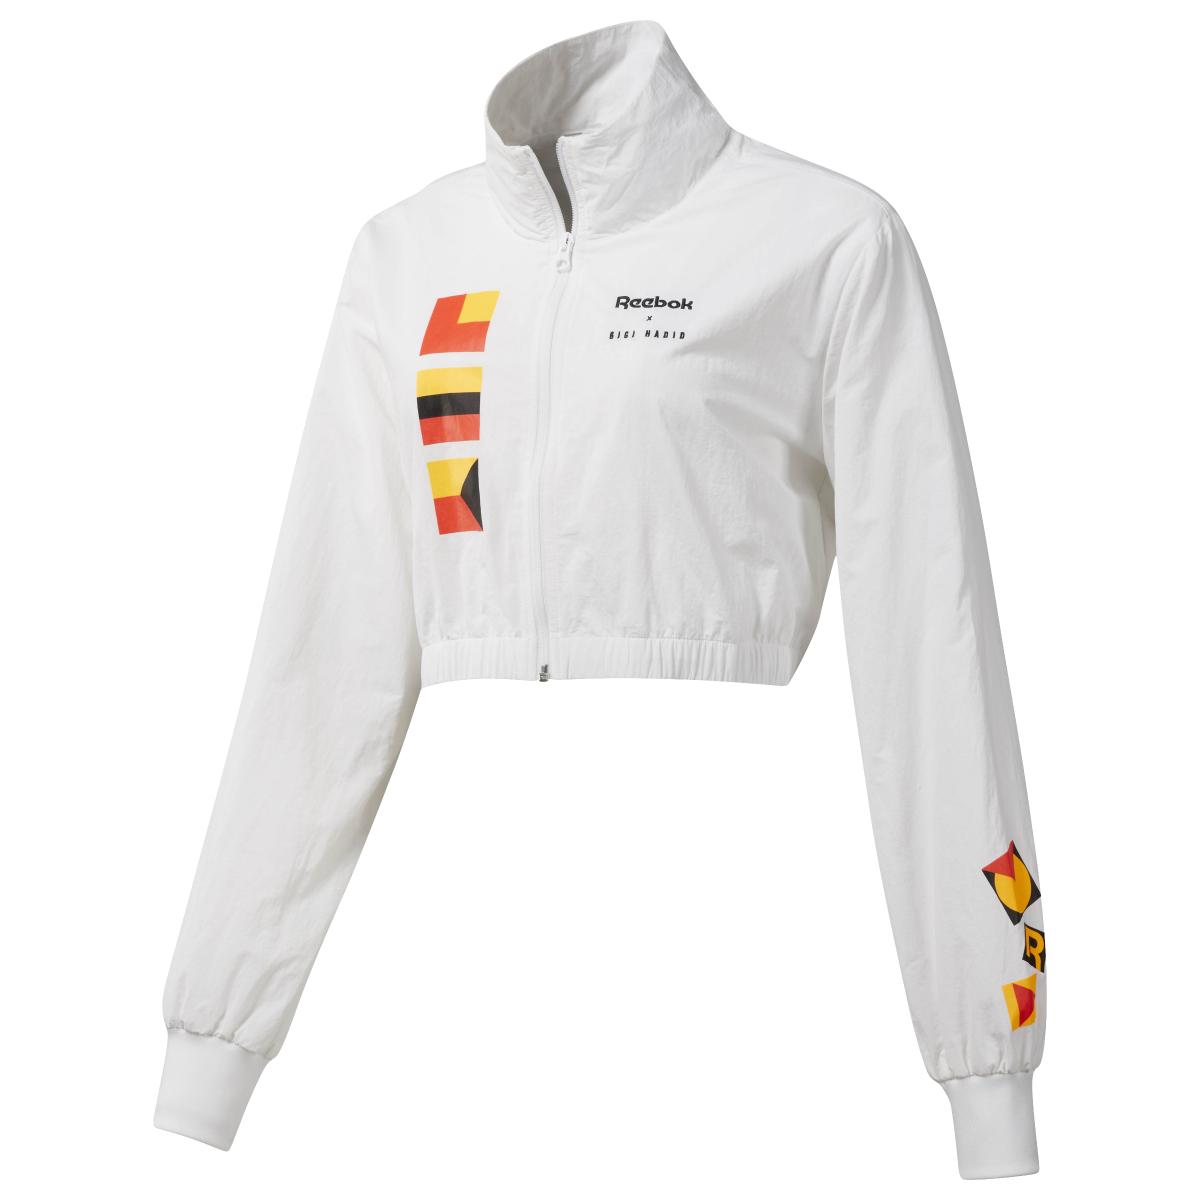 CL GH トラックジャケット ¥9,709(税込)/リーボック クラシック(リーボック × ジジ・ハディッド コレクション)